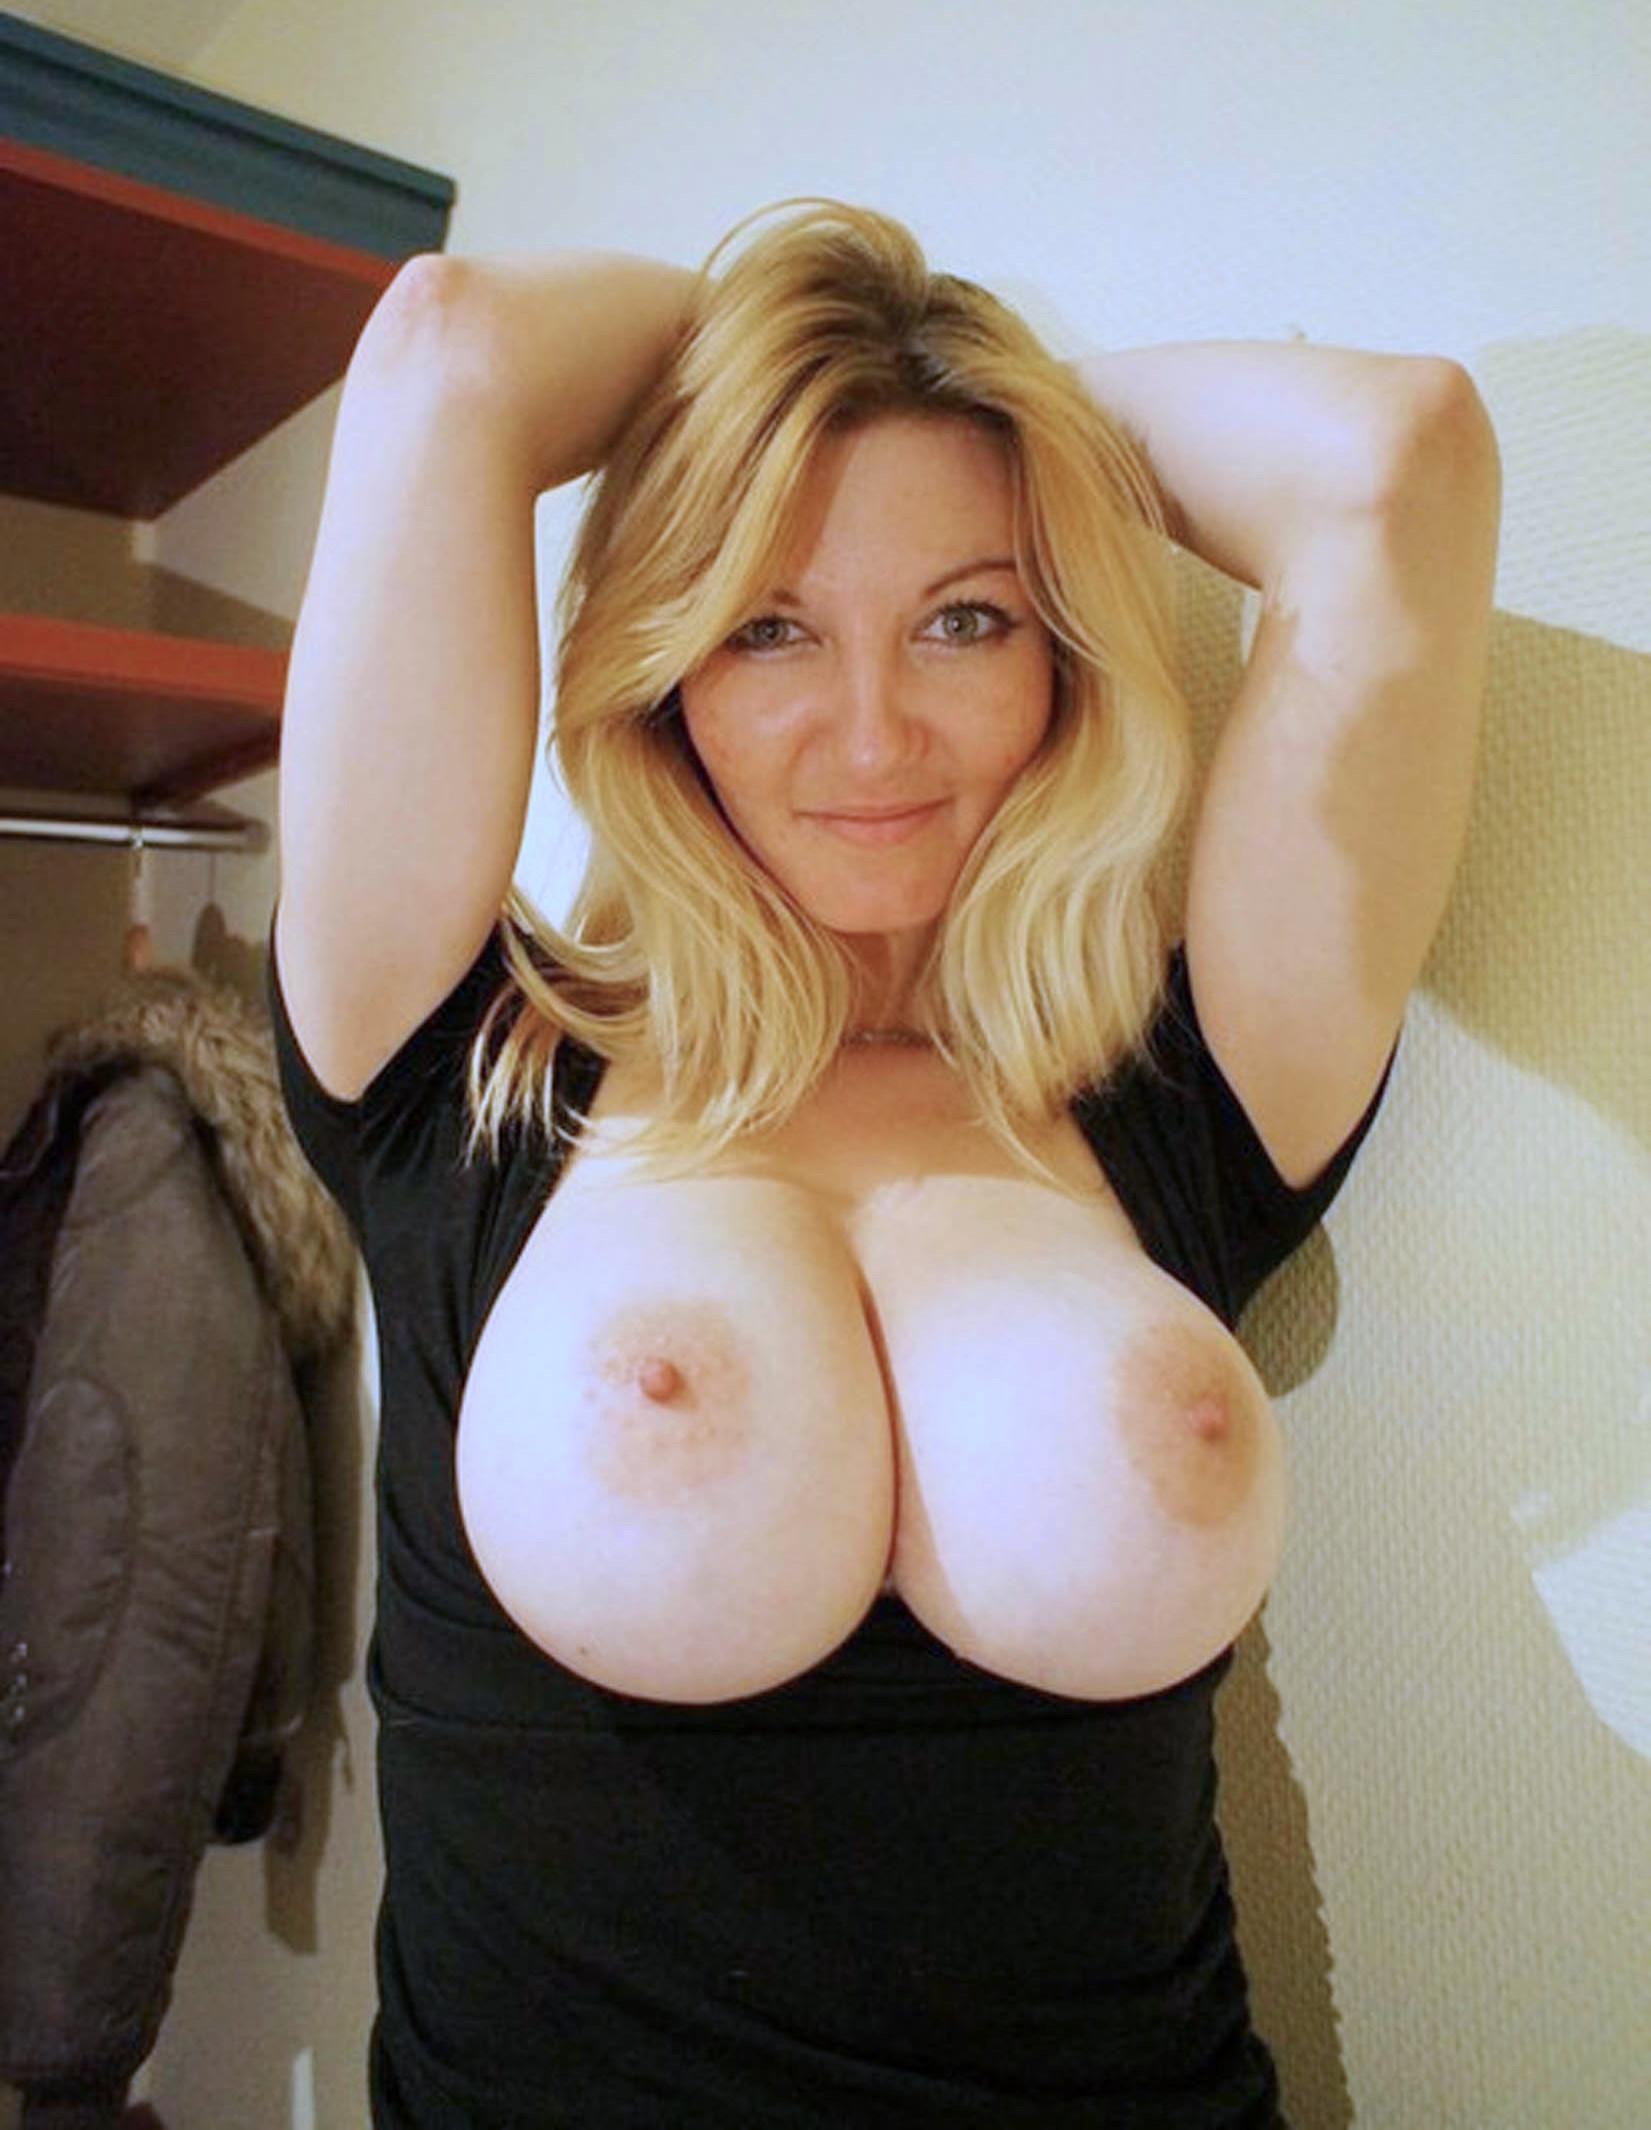 Подборка дам с гигантскими грудями